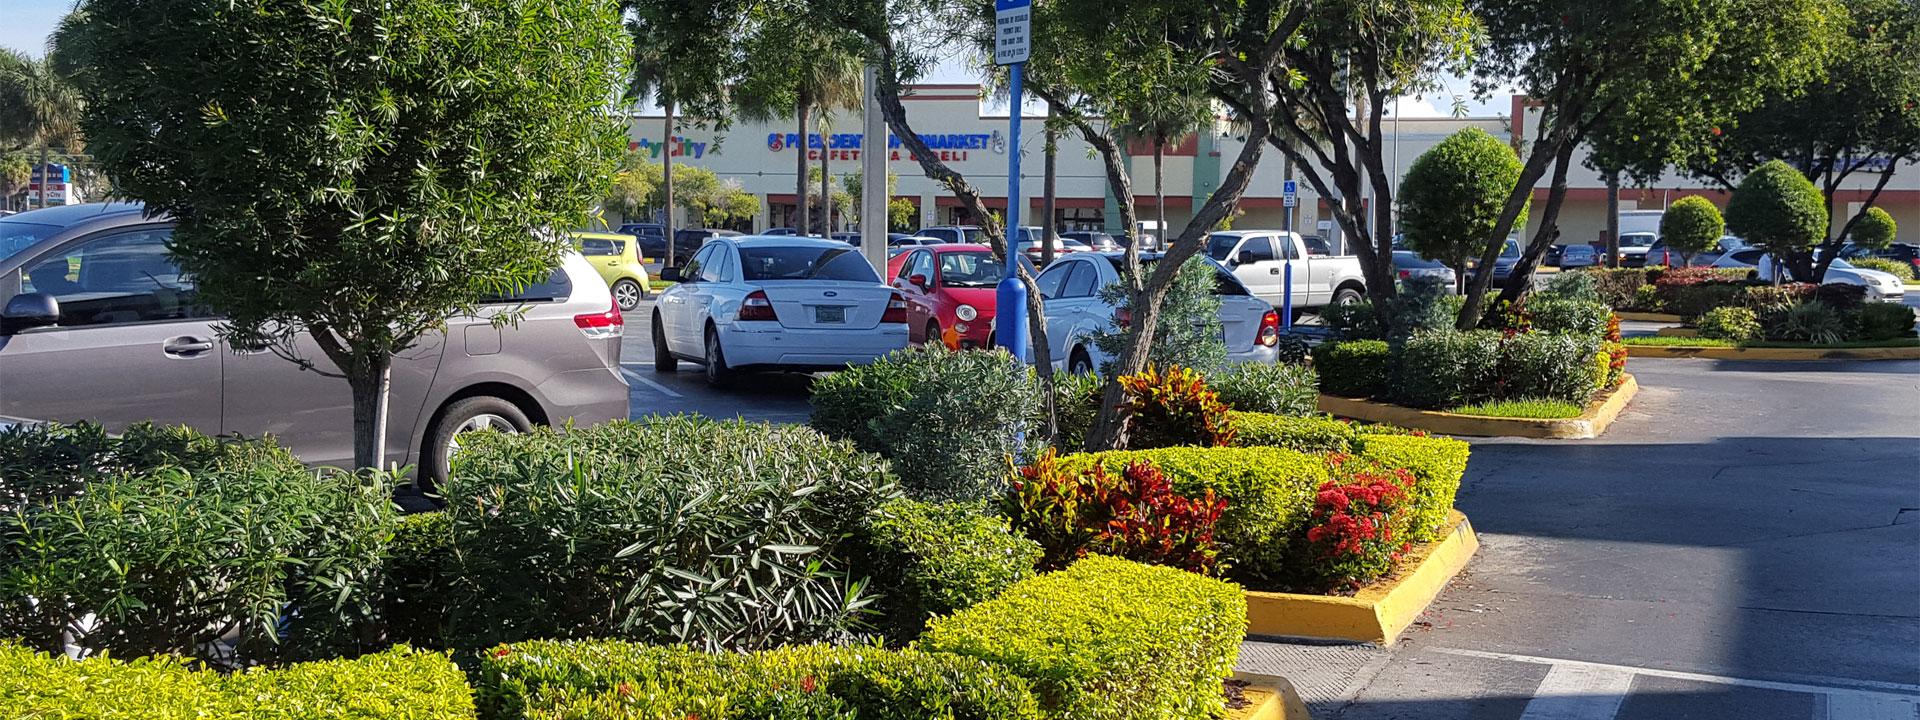 green experts parking